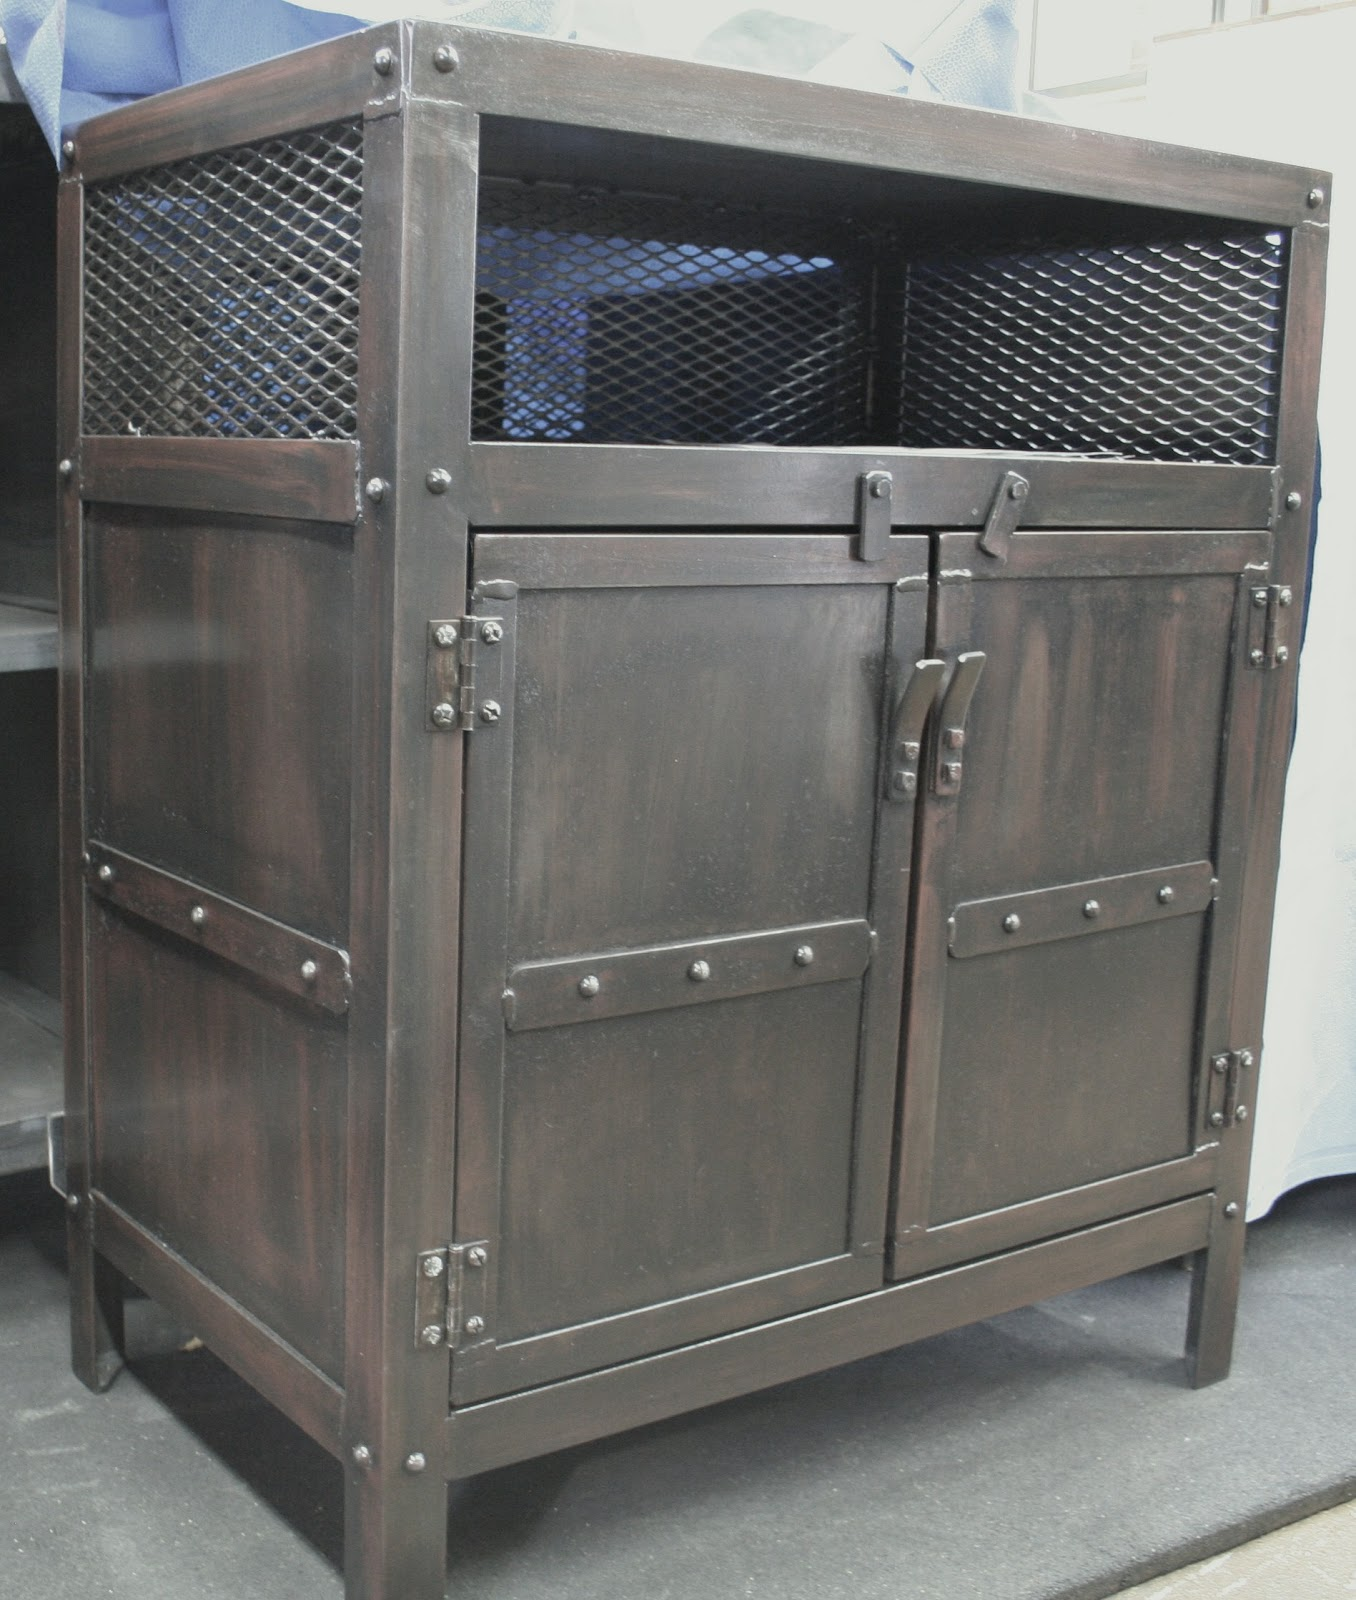 Real Industrial Edge Furniture Llc: Industrial Nightstand